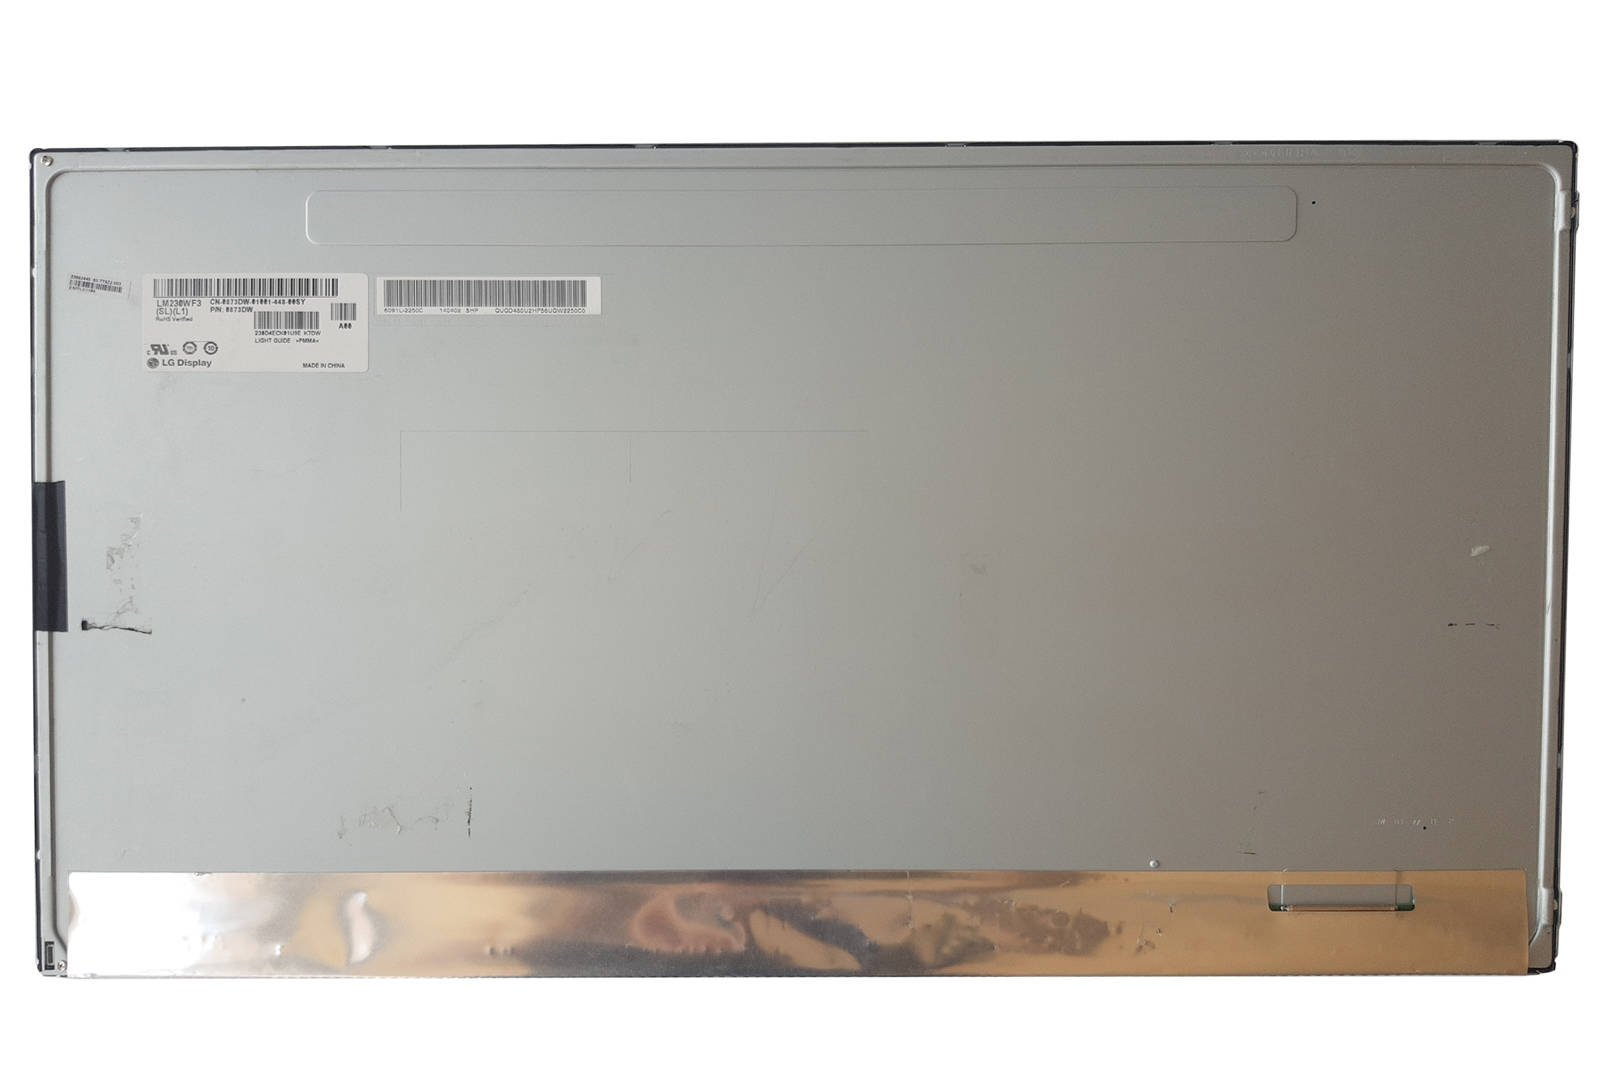 Display Panel Screen LG DIsplay 23' LM230WF3-SLL1